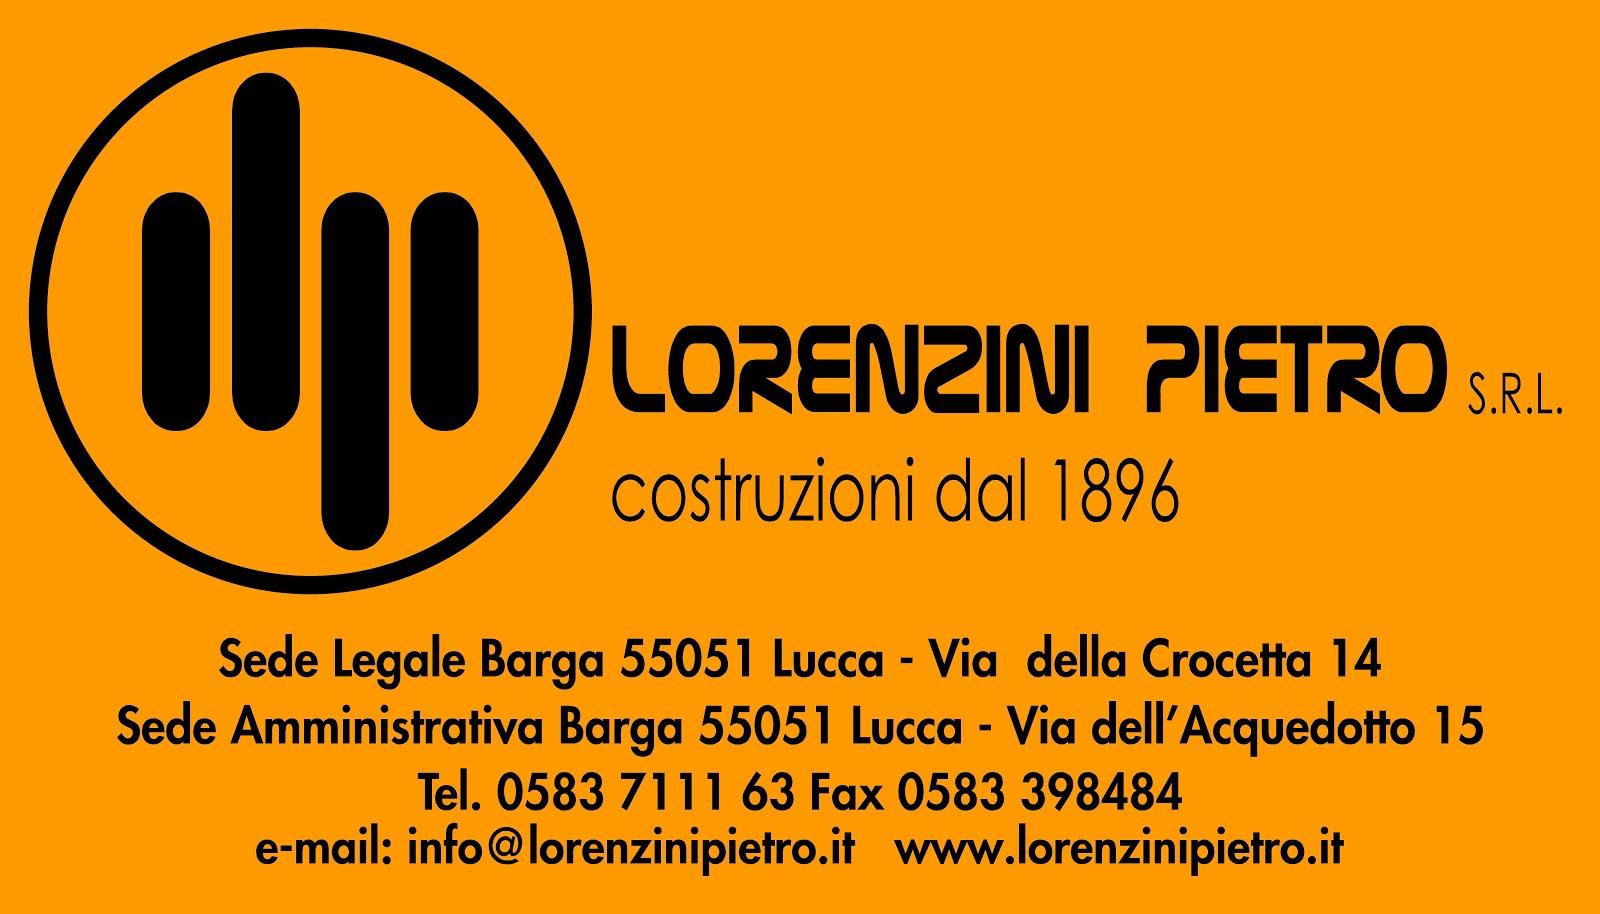 Lorenzini Pietro Srl